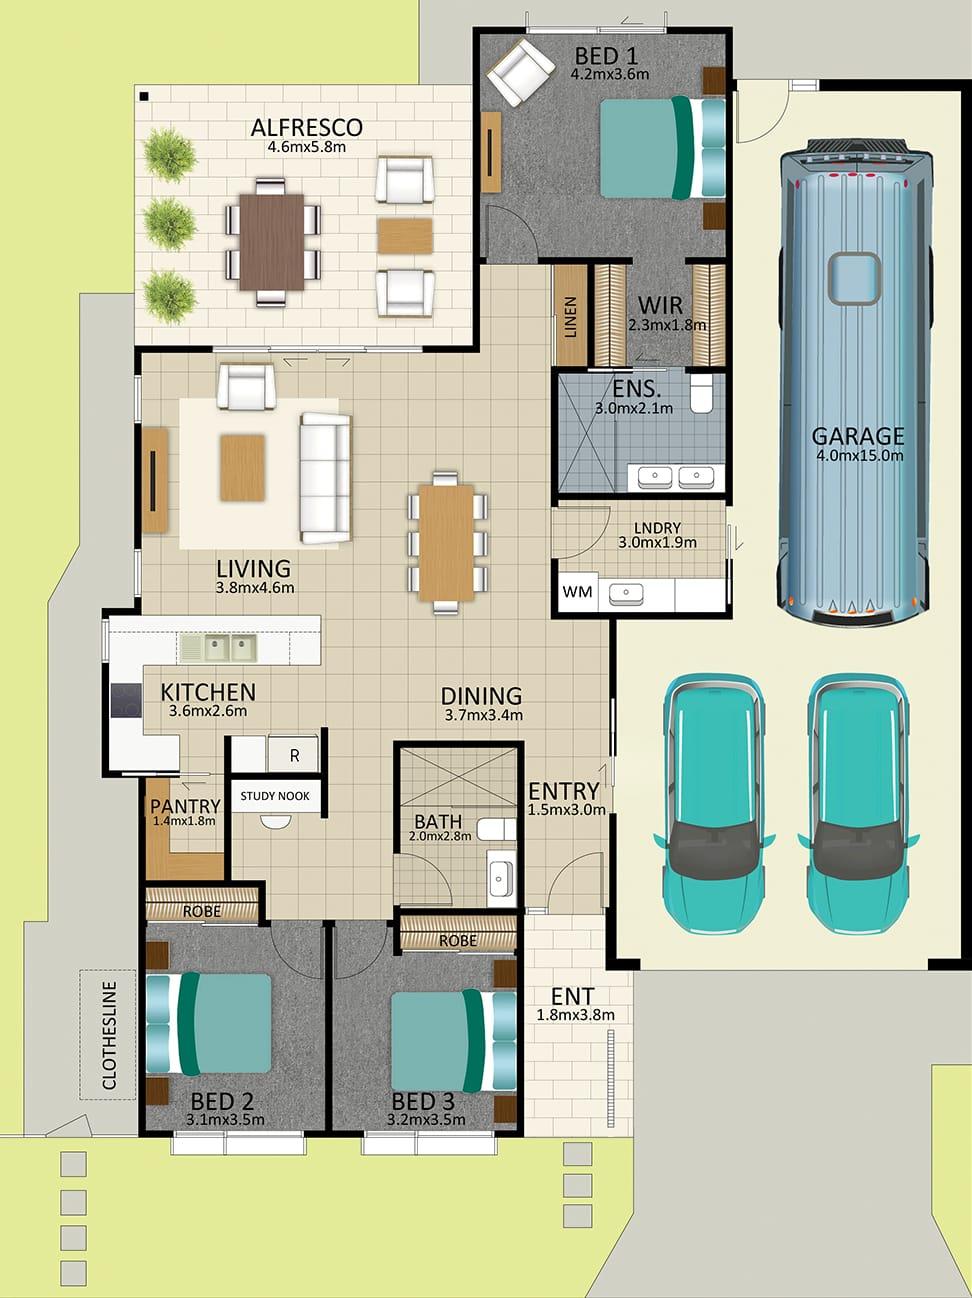 LR WEB LAT25 Floorplan Watson MK3 FEB19 - Lot 111